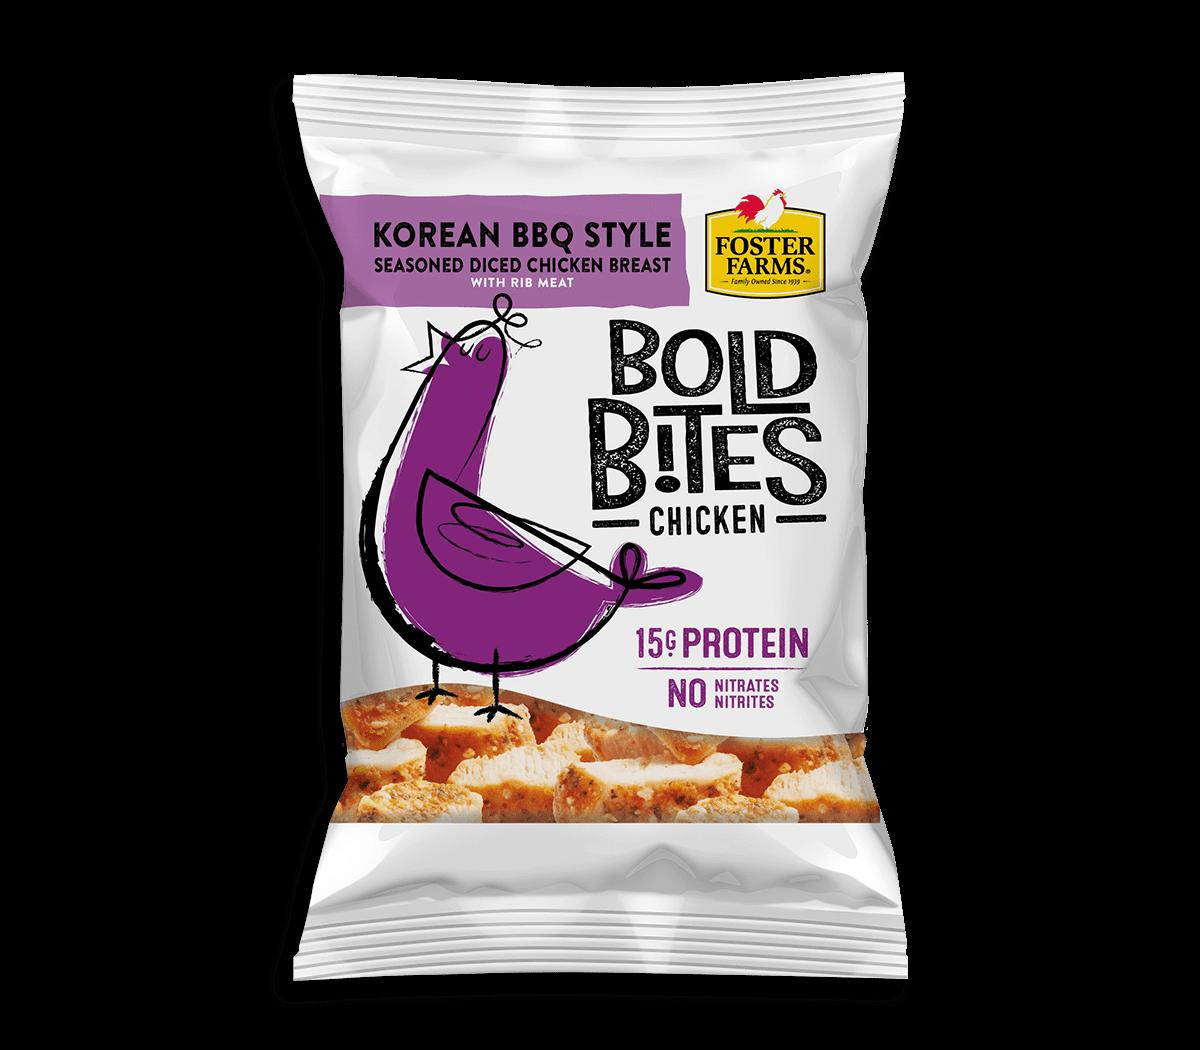 Korean BBQ Style Bold Bites